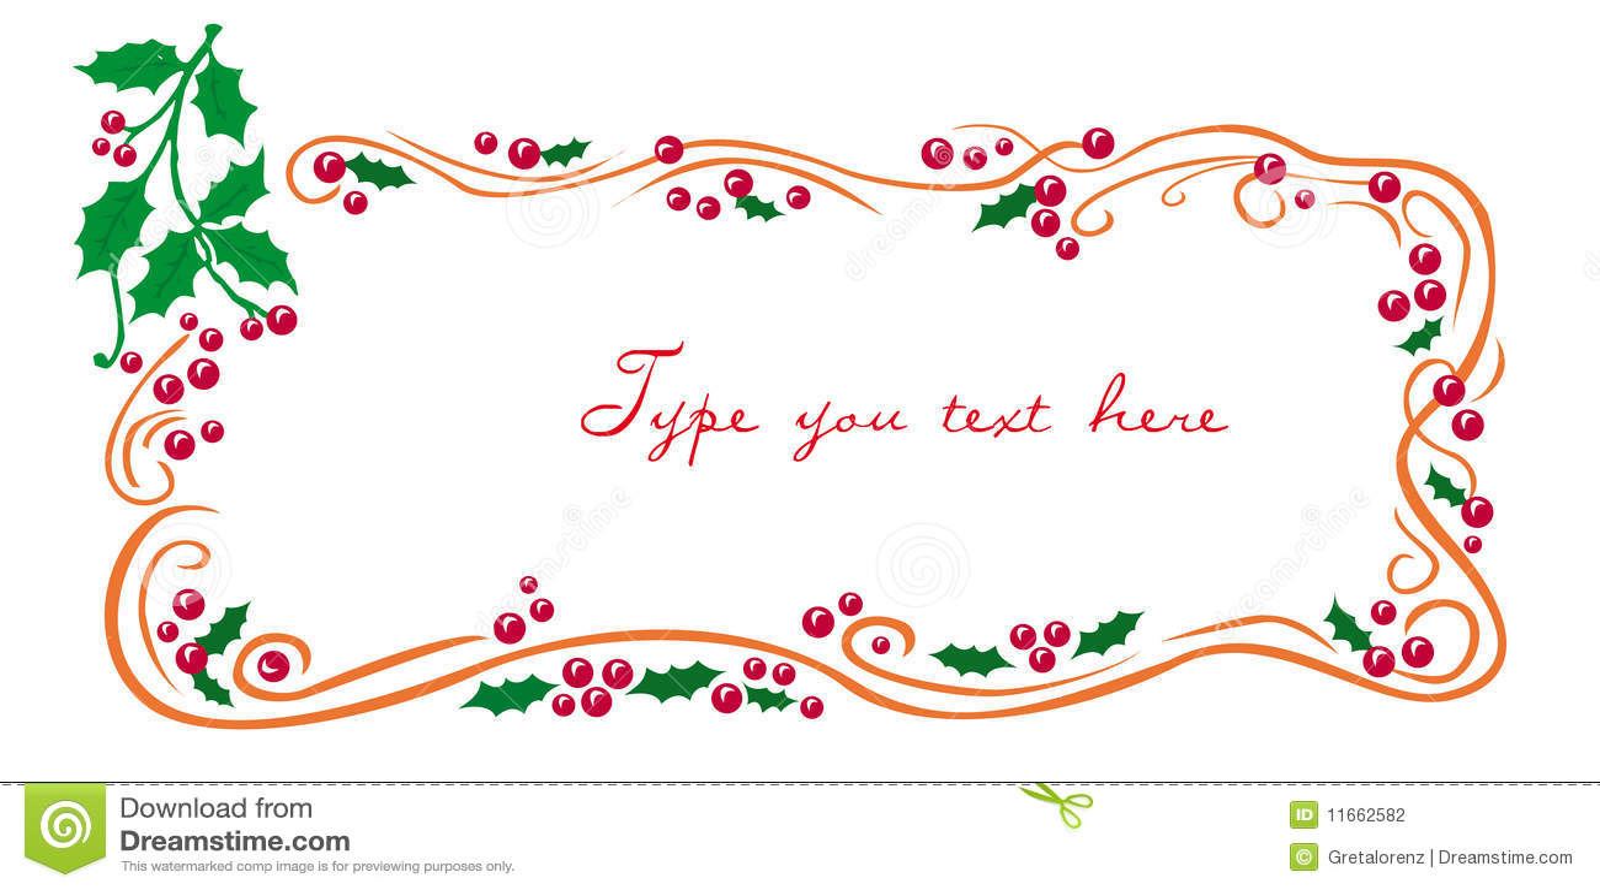 Christmas Greetings Frame With Mistletoe Stock Vector